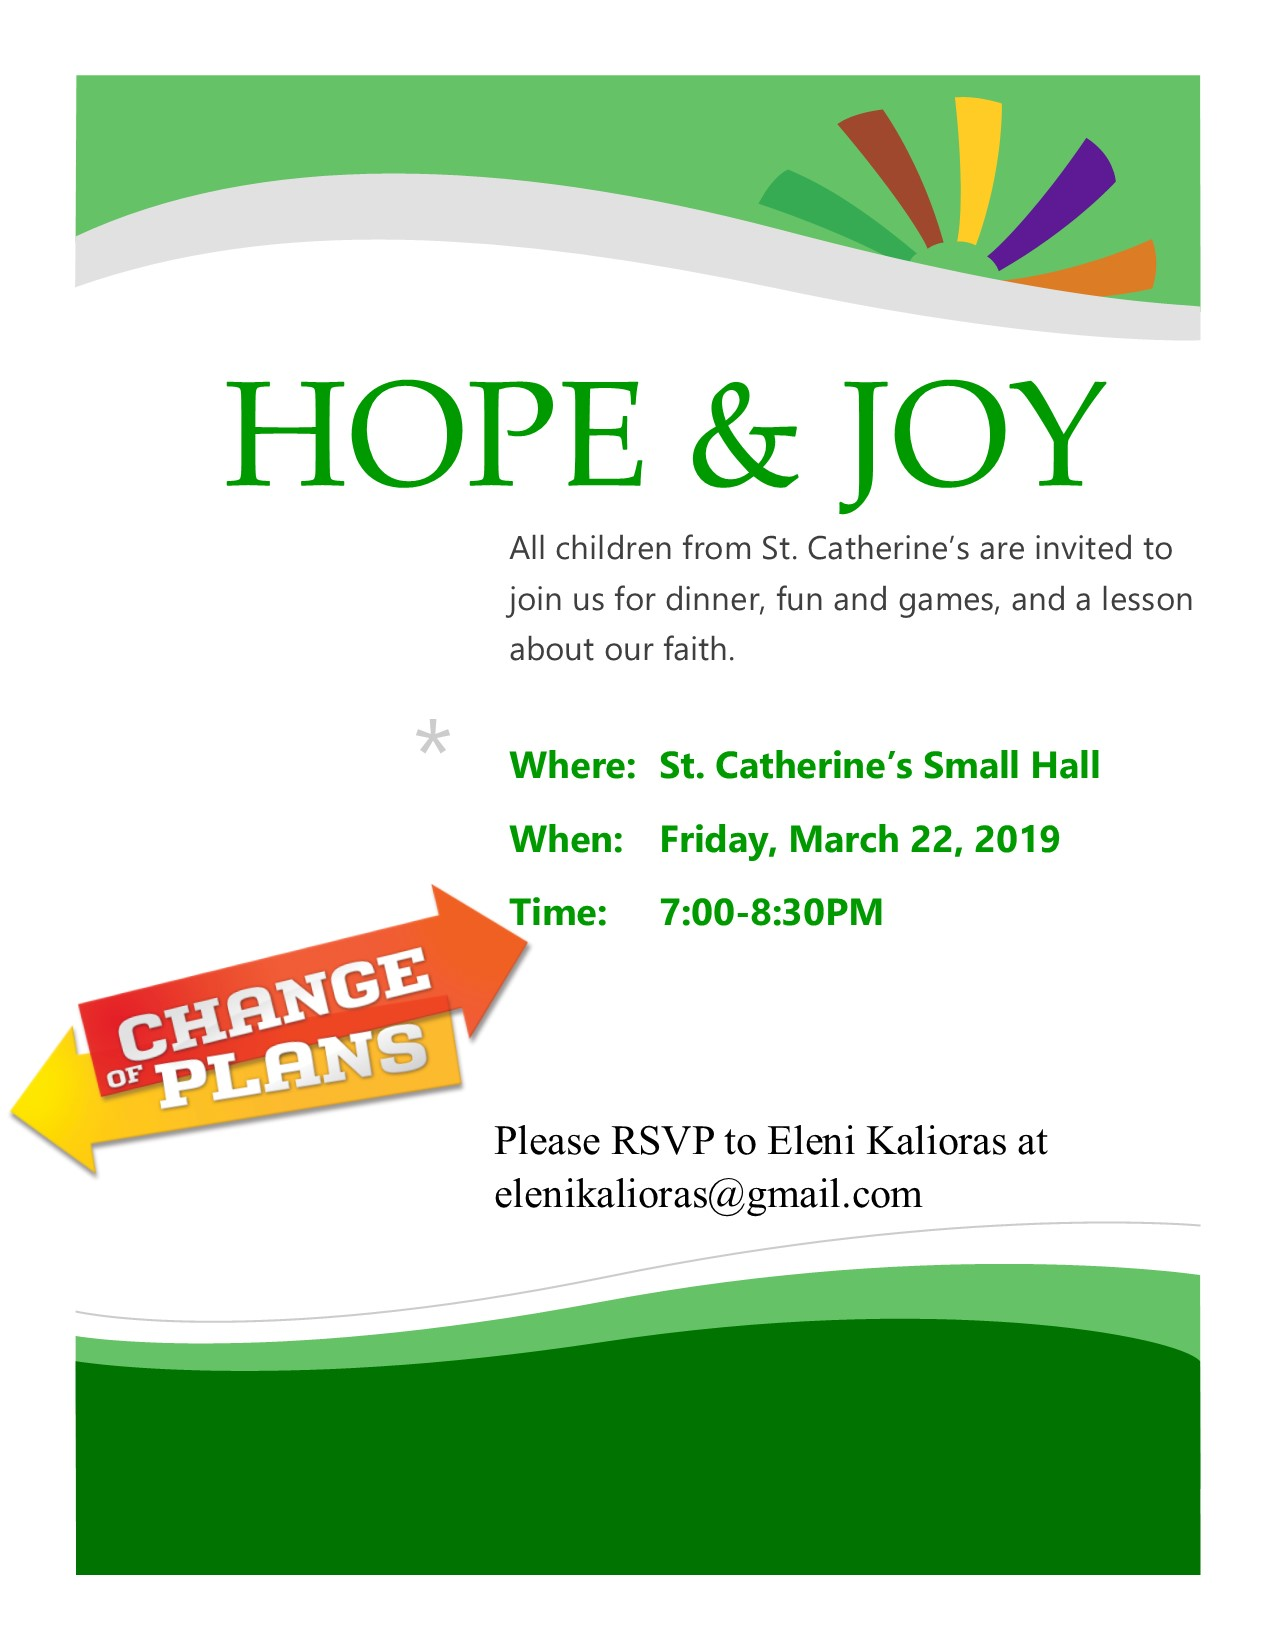 HOPE and JOY CHANGED.jpg